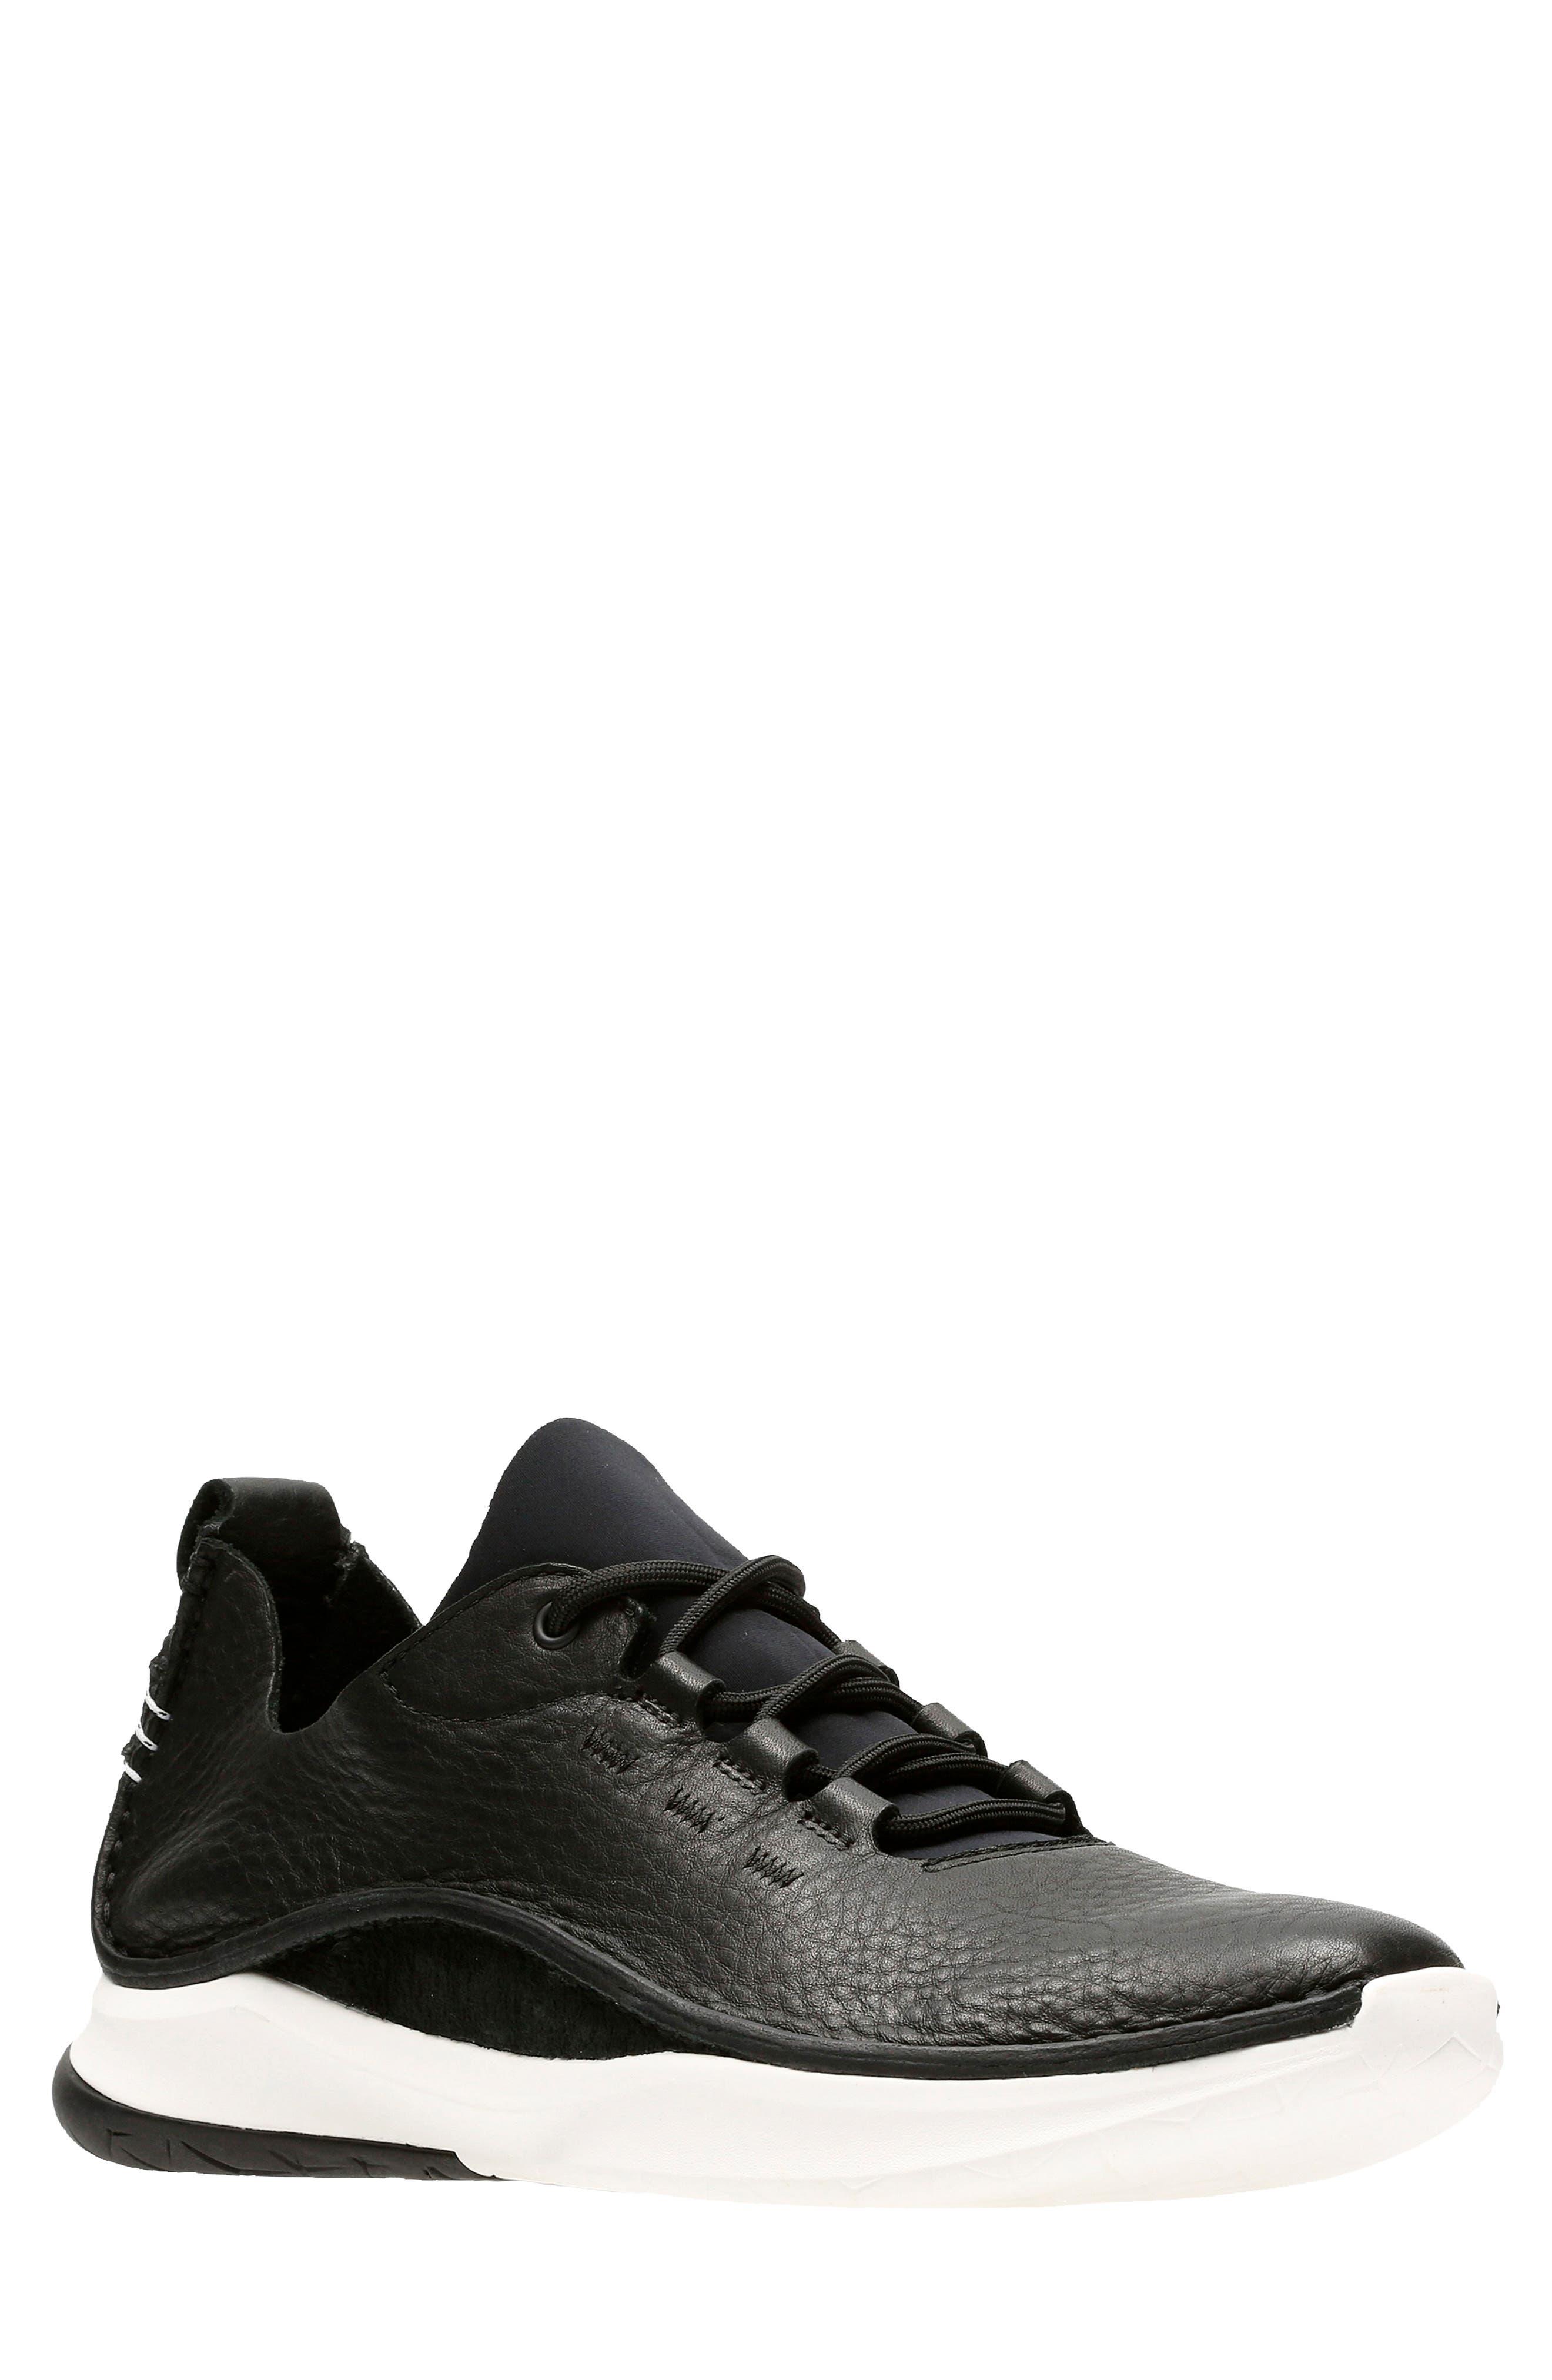 Privolution Lo Sneaker,                         Main,                         color, BLACKOUT